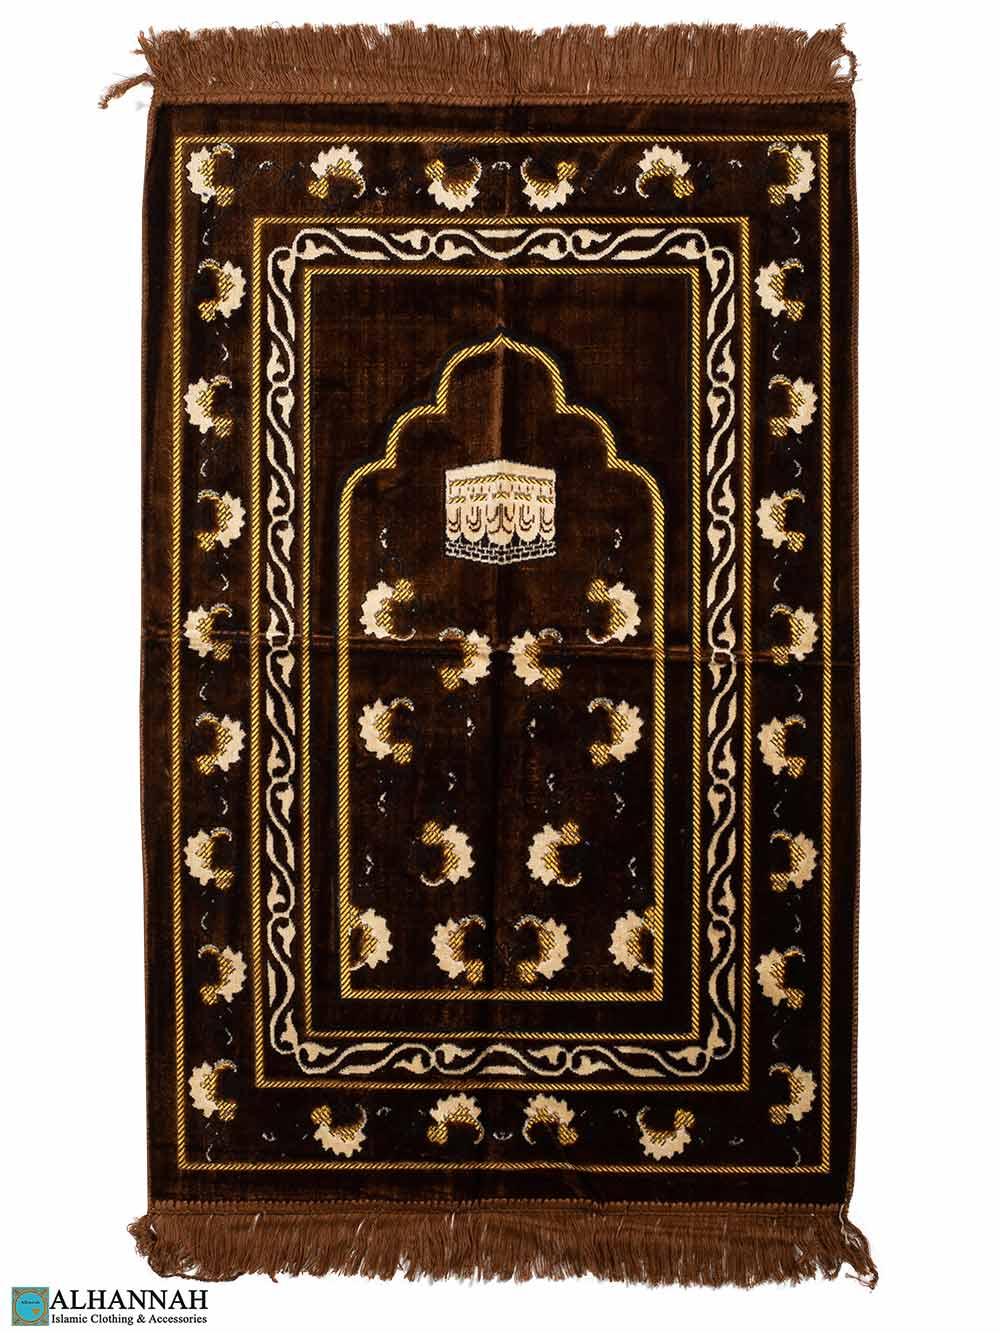 Prayer Rug with Kaaba Motif - Brown